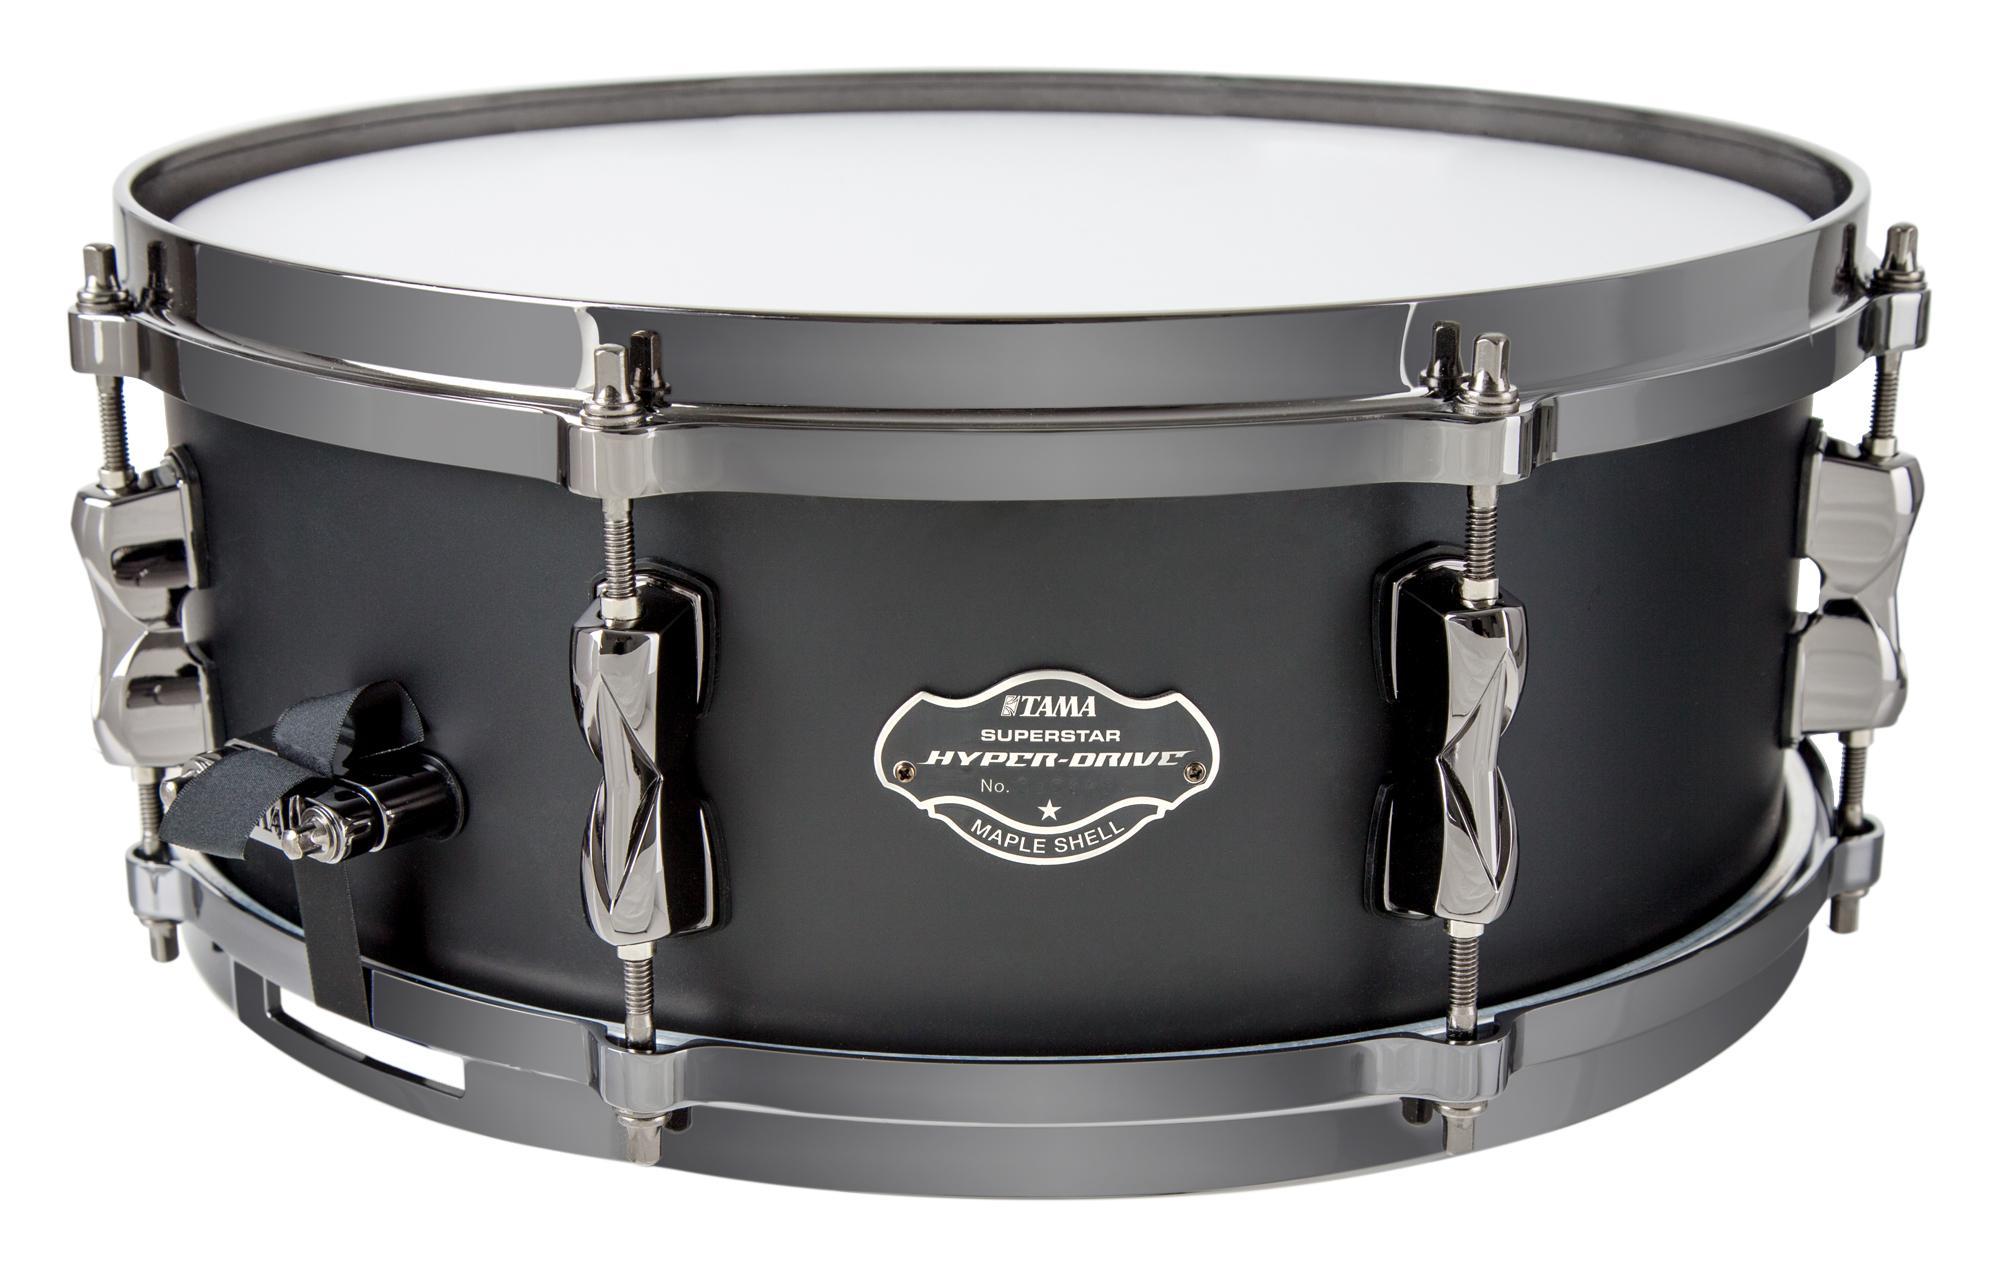 Tama MLS55BN FBK 14' x 5,5' Snare Drum Flat Black